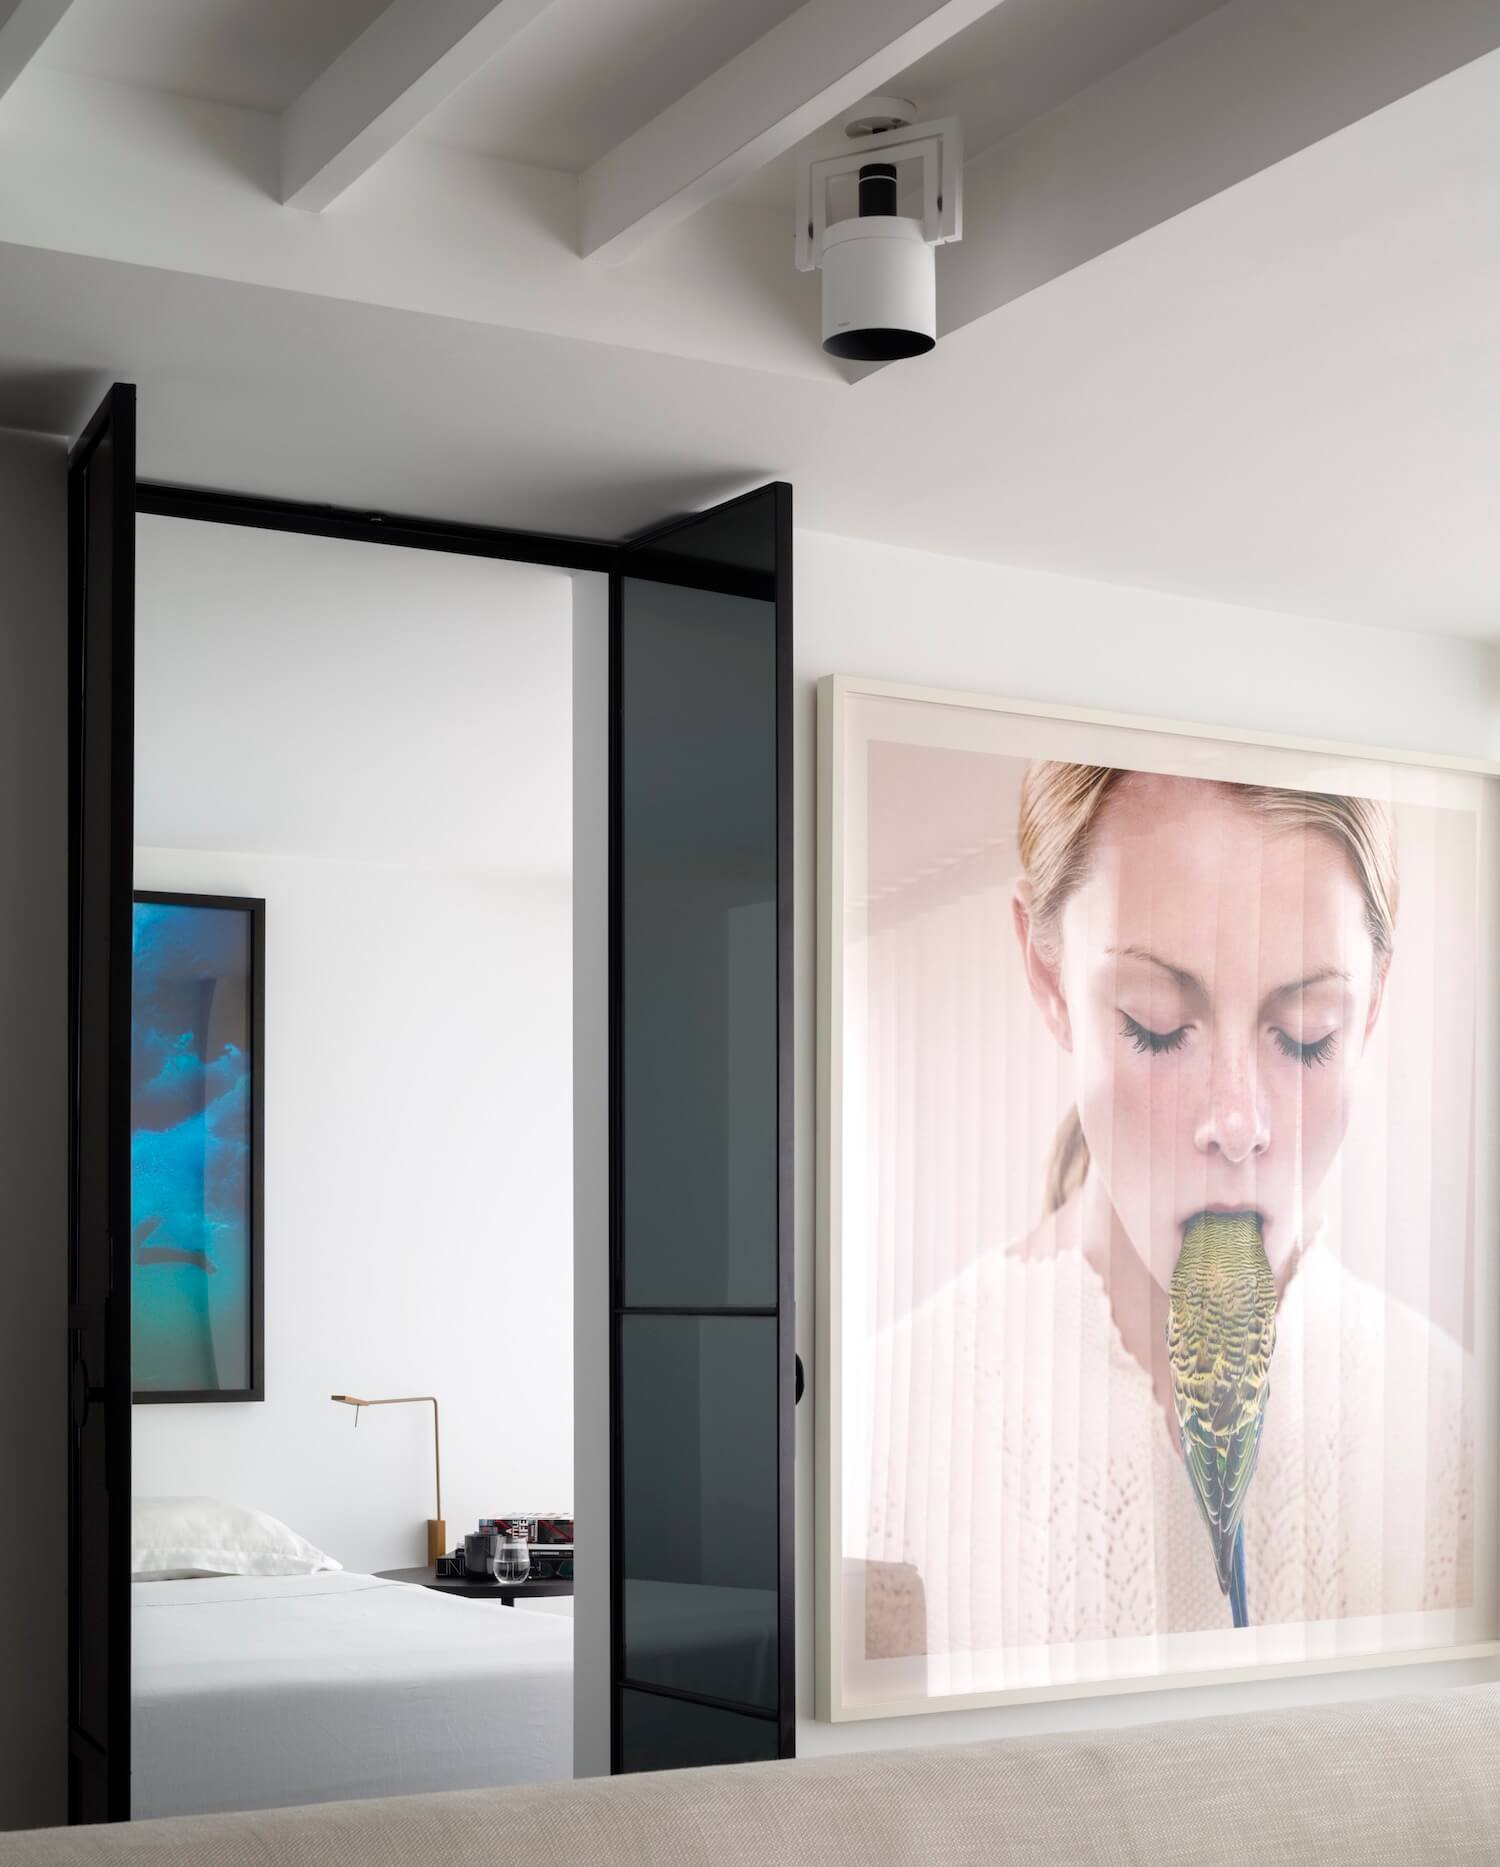 est living interiors lawless meyerson bondi apartment 8